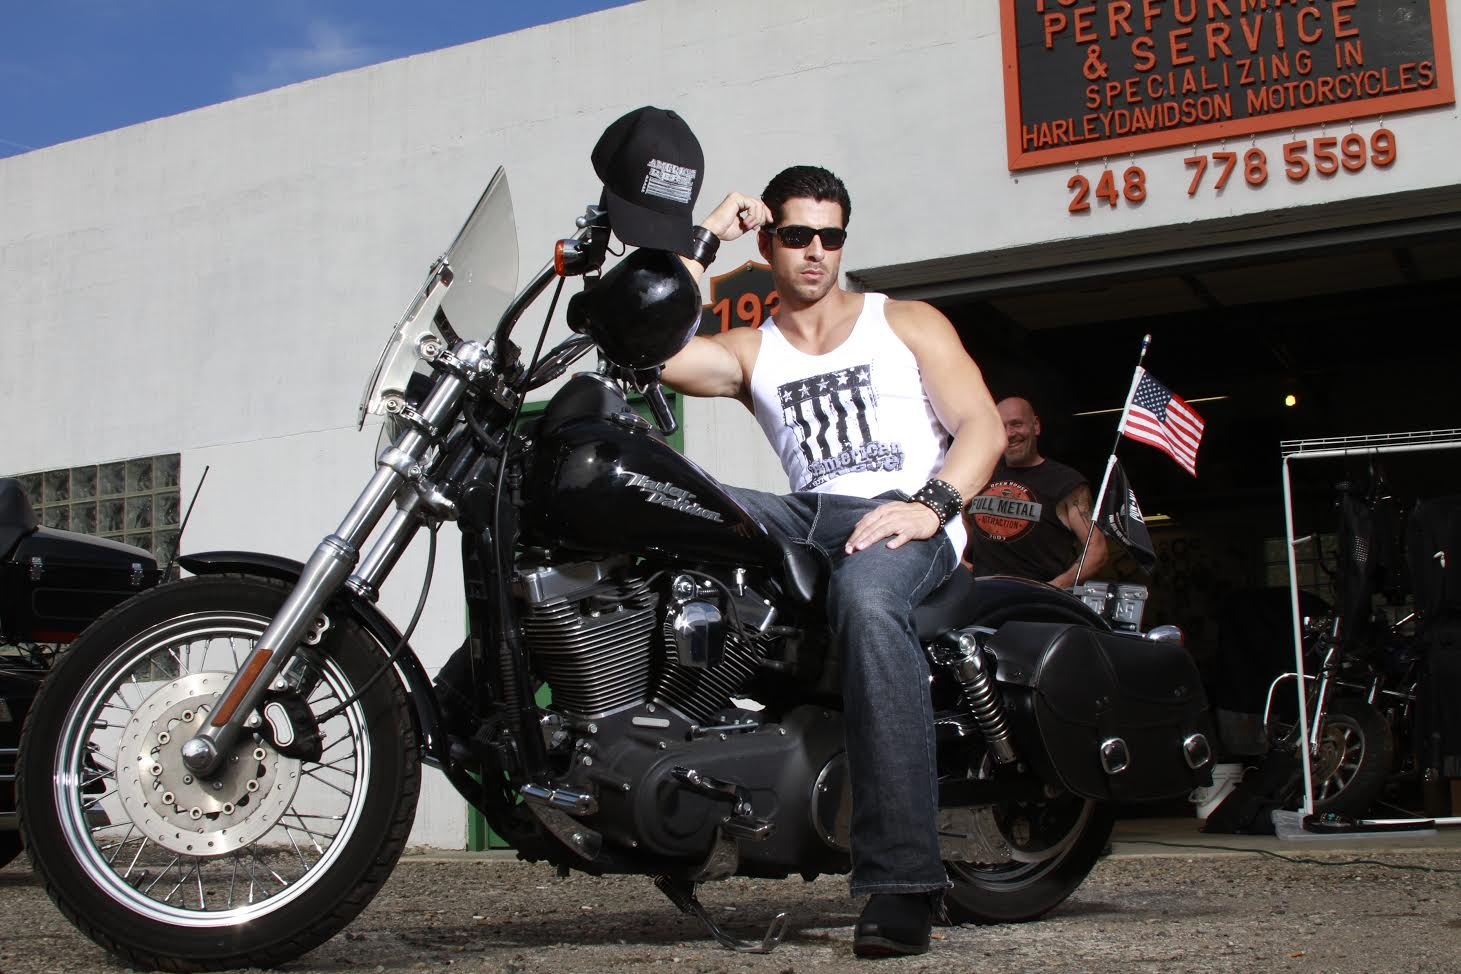 American Rebel on a Motorcycle